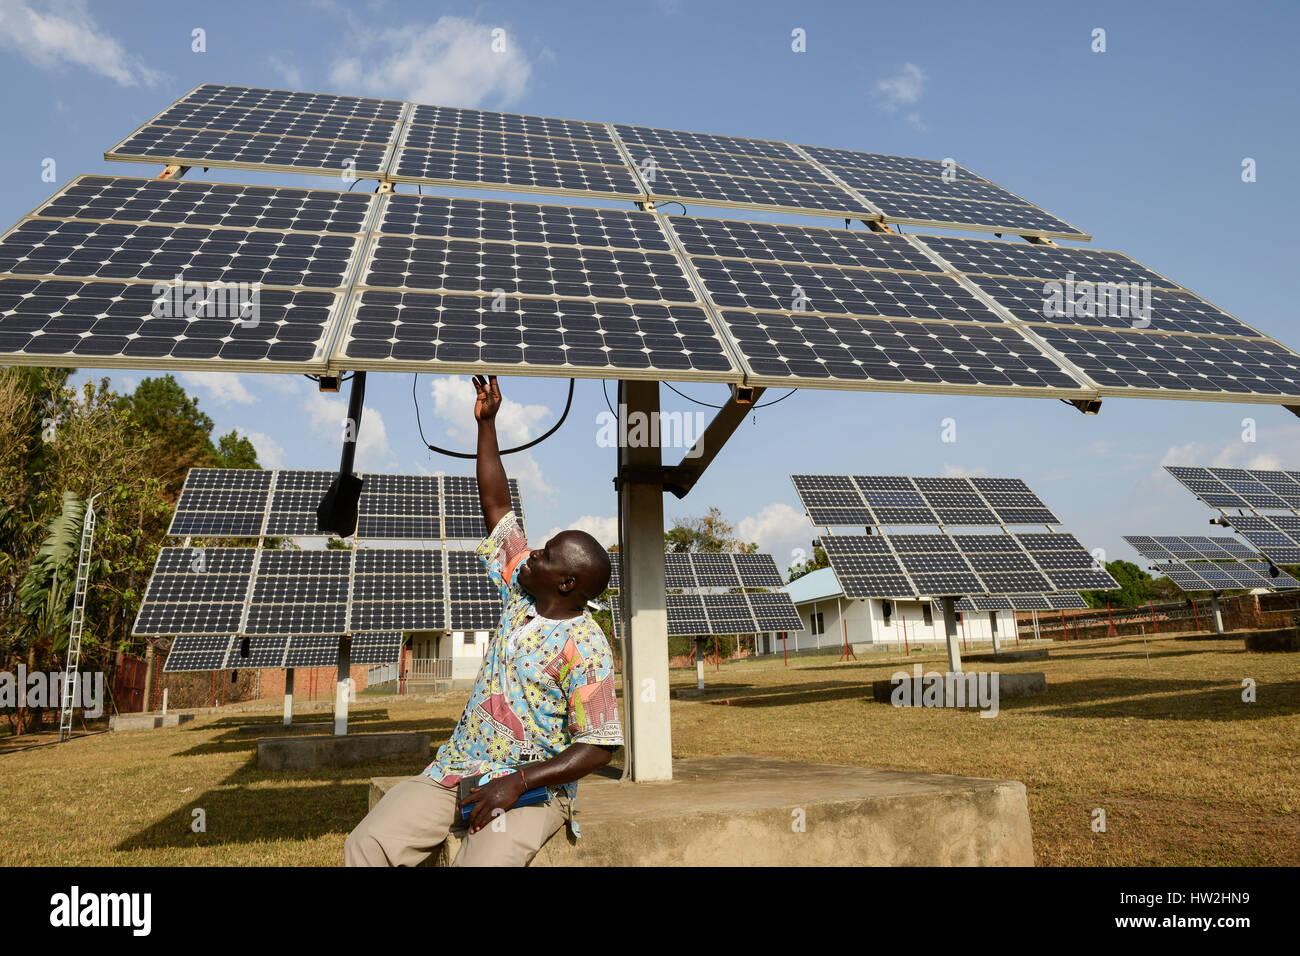 UGANDA, Arua, solar power, swingable solar panels for power supply of Radio station Radio Pacis / autarke Stromversorgung - Stock Image